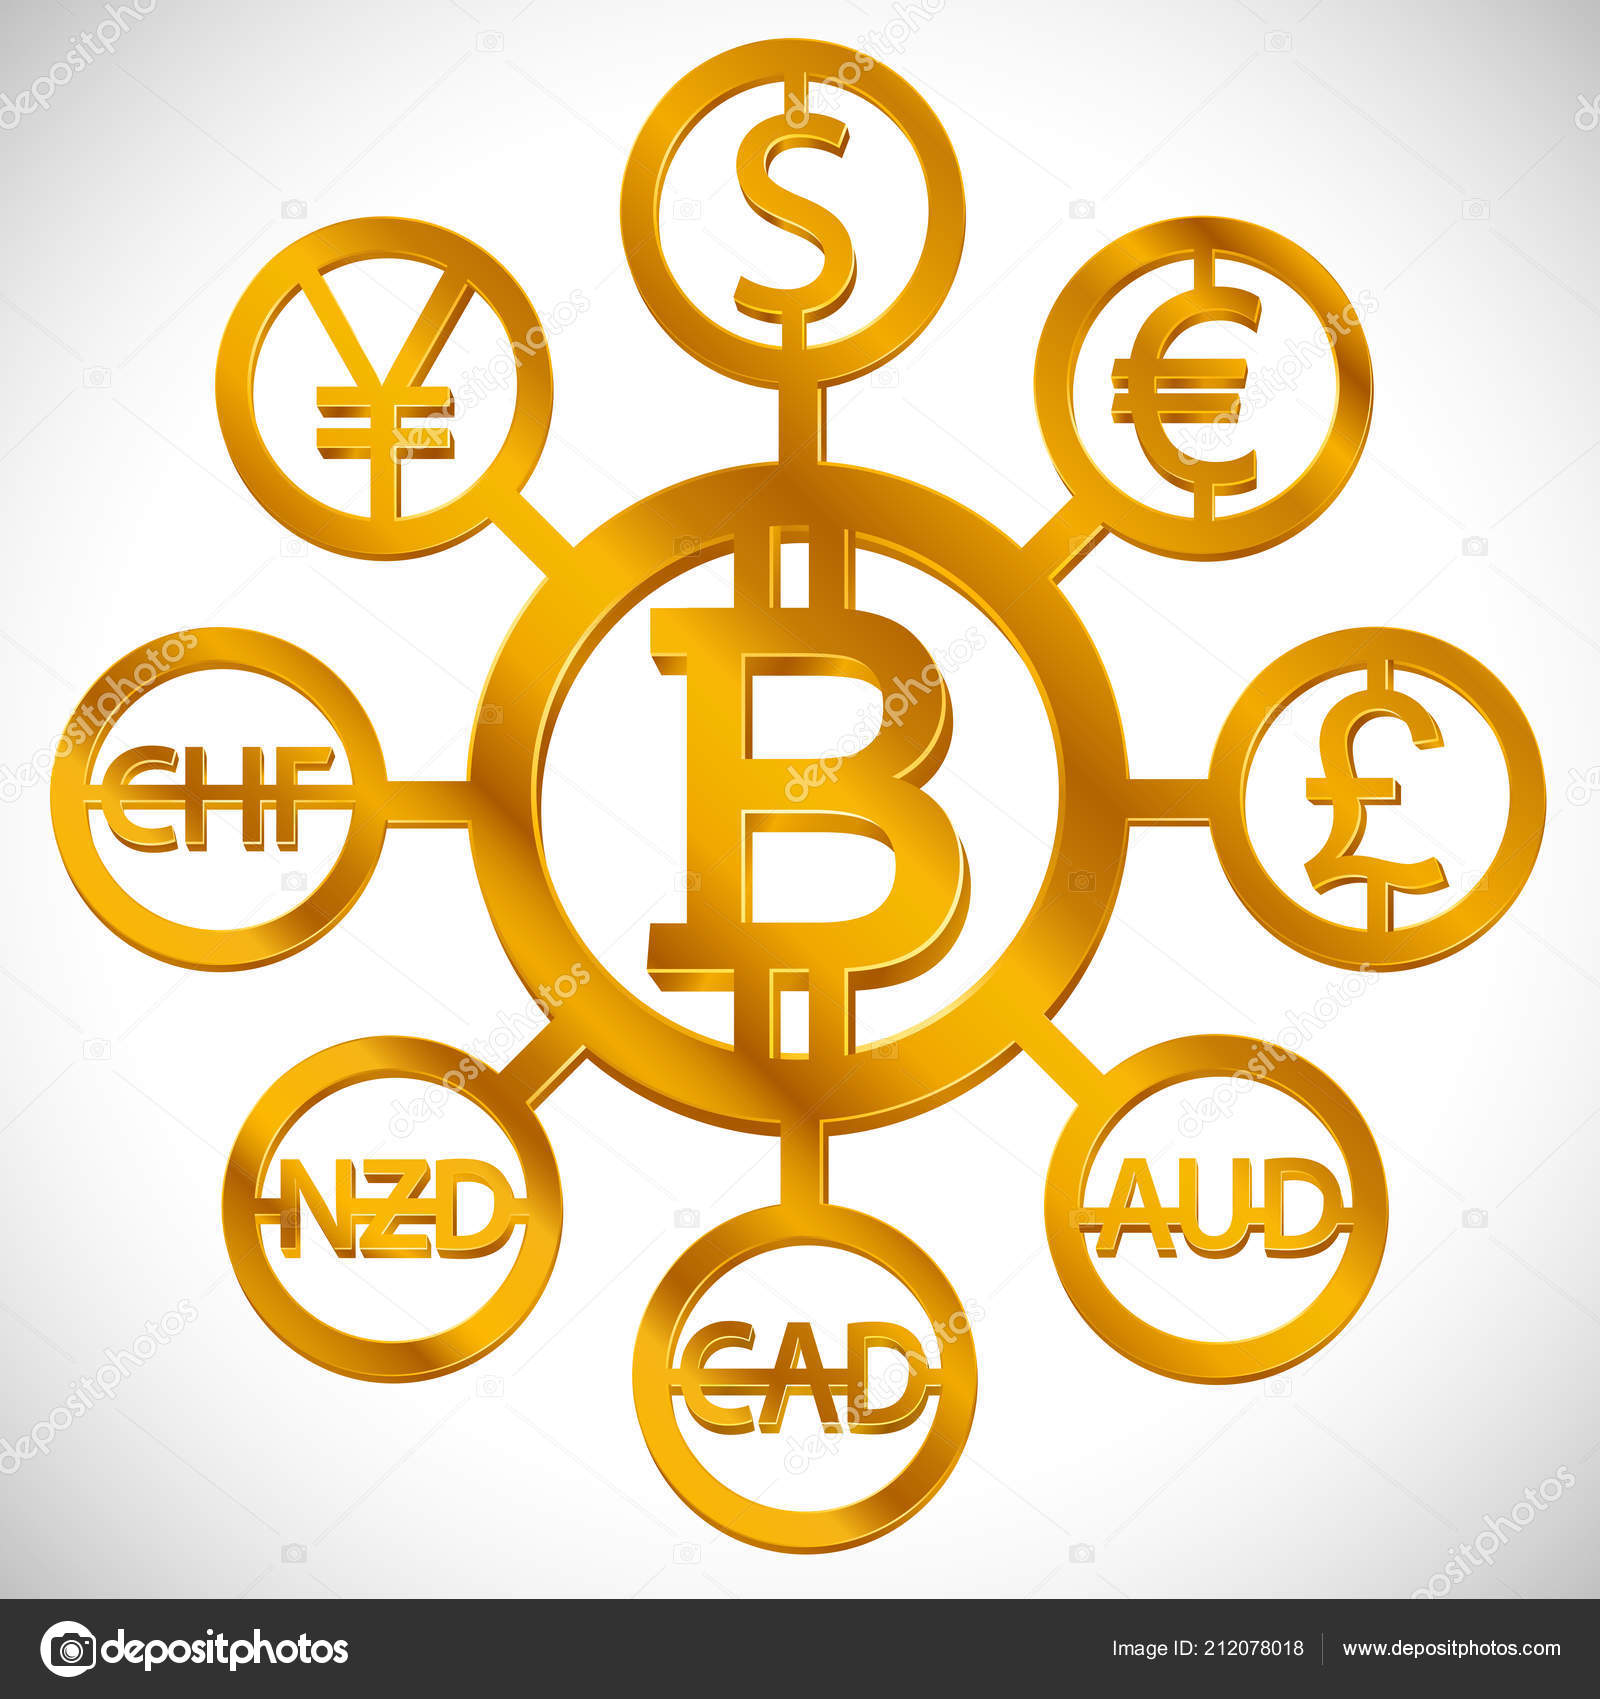 World Currencies Design Creative Concept Signs Dollar Icon Bitcoin